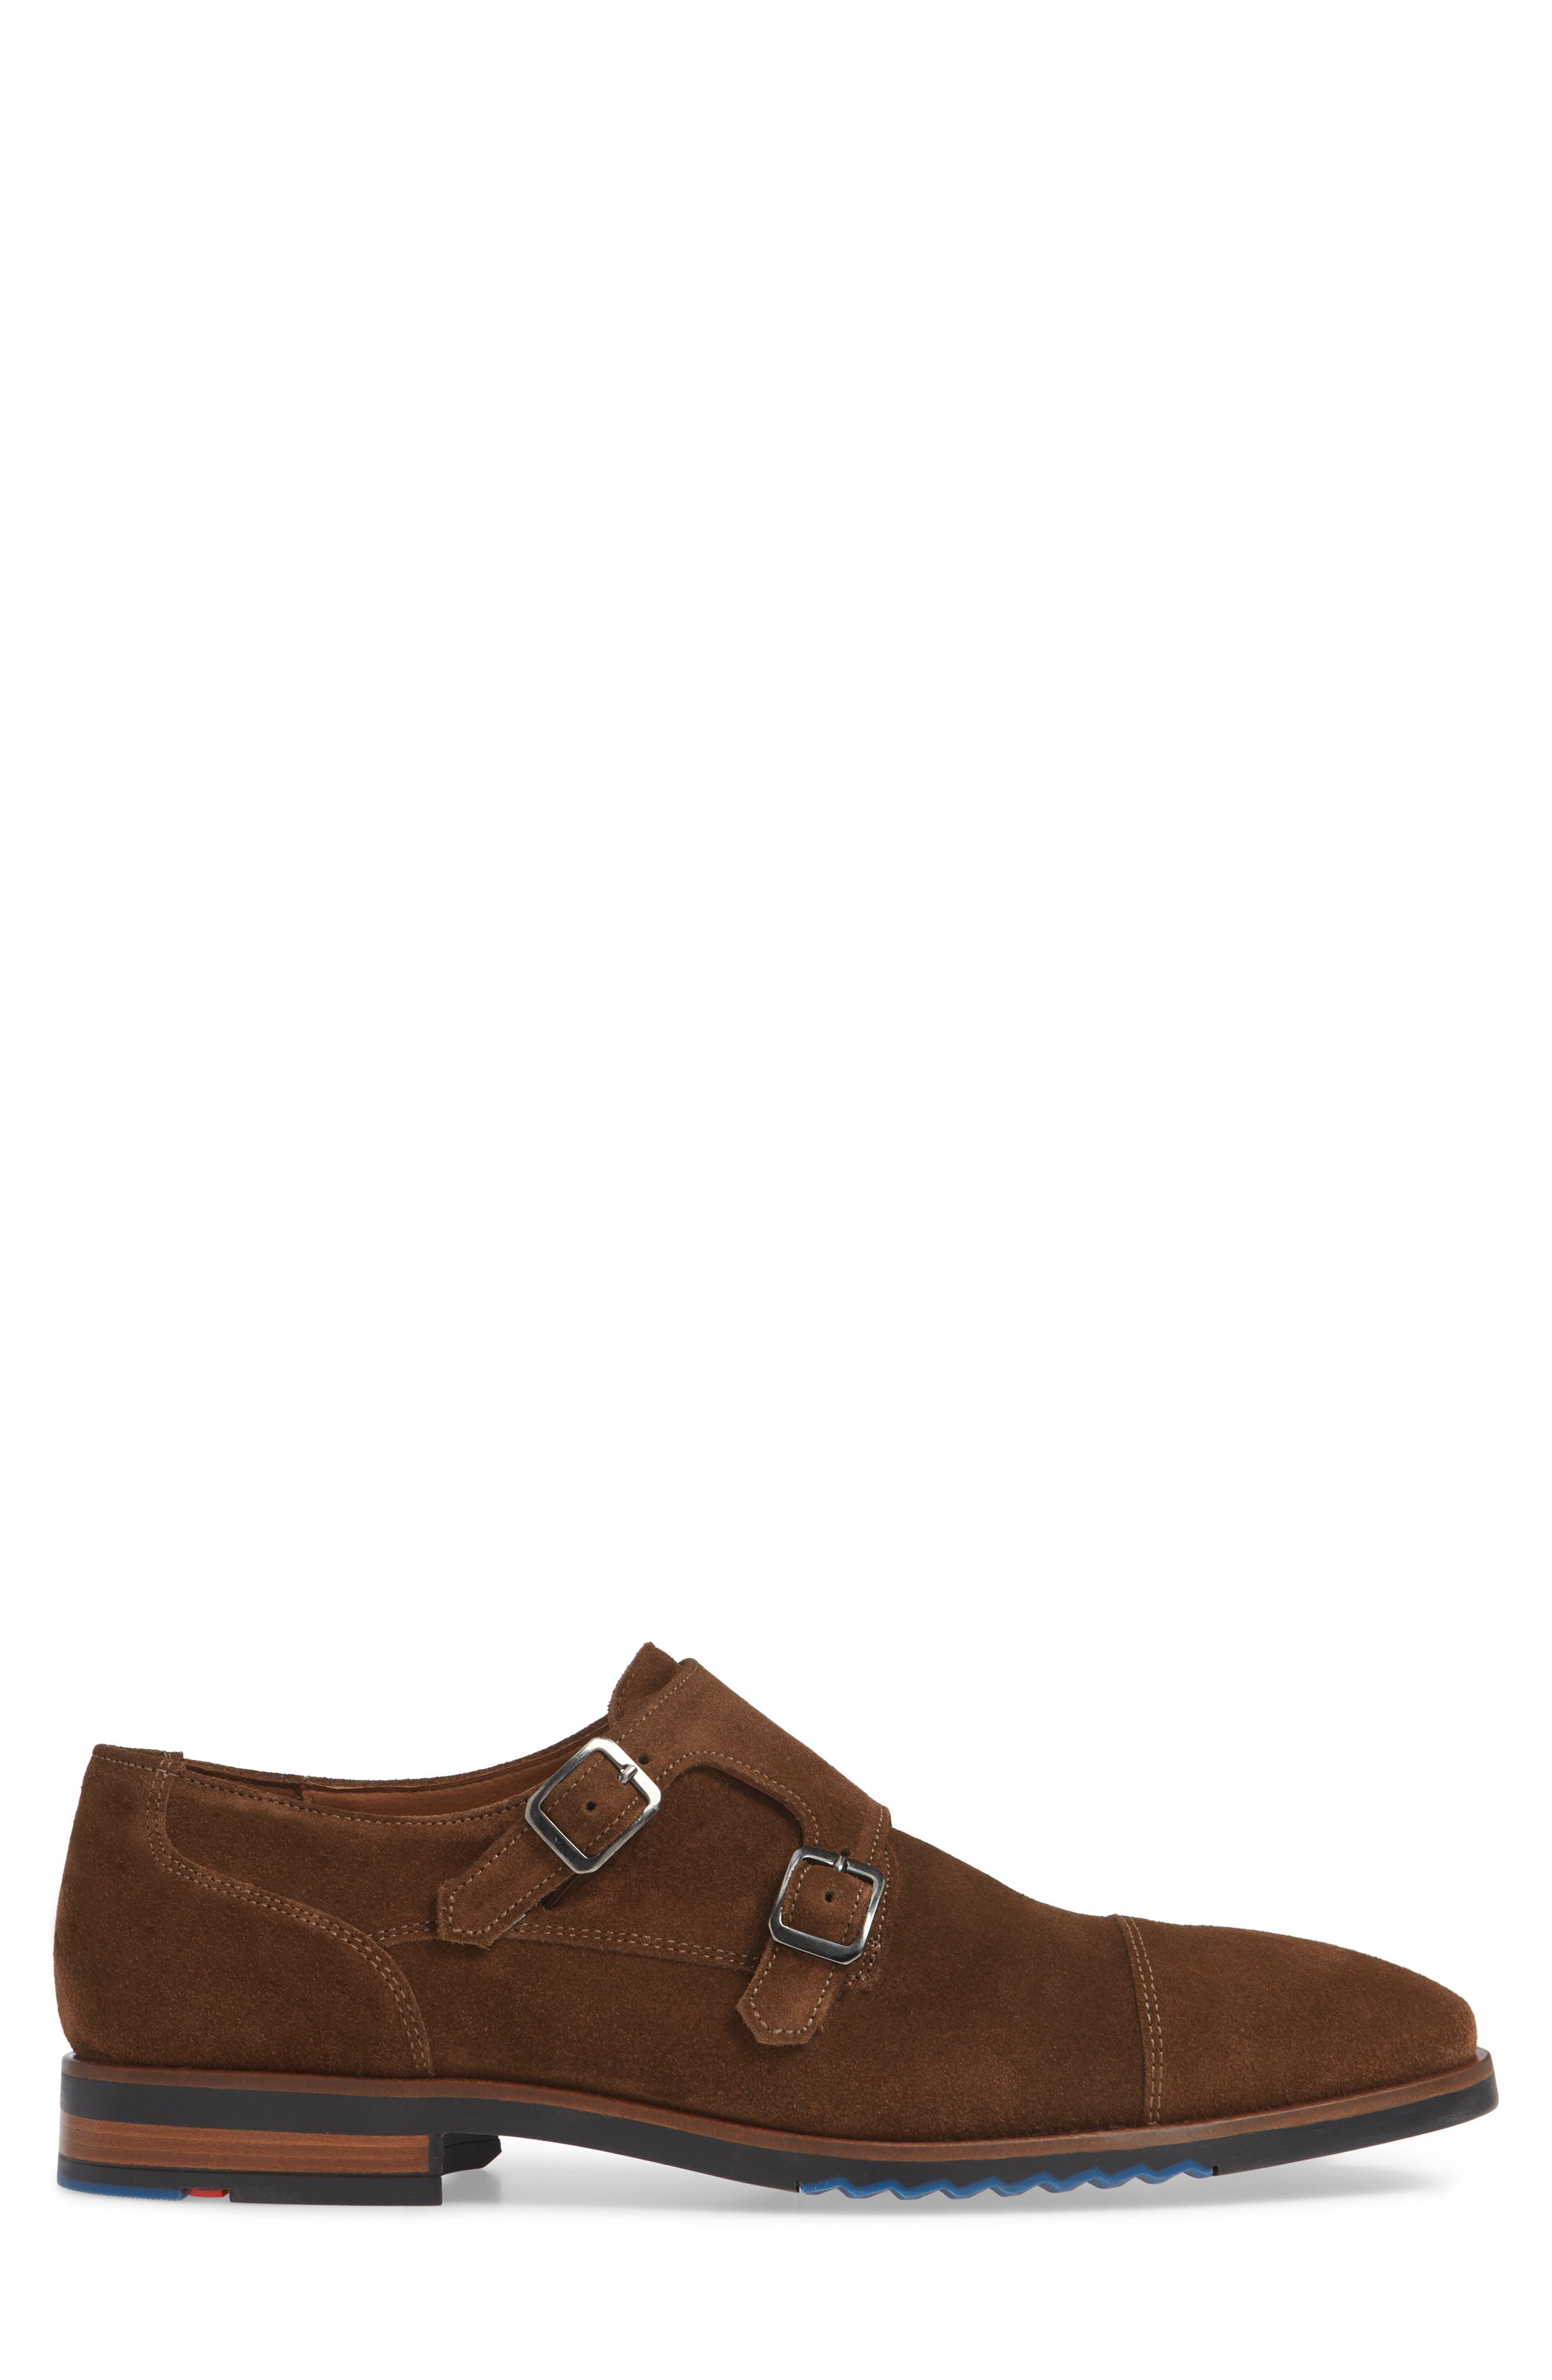 Darrow Double Monk Strap Shoe,                             Alternate thumbnail 3, color,                             CIGAR BROWN SUEDE